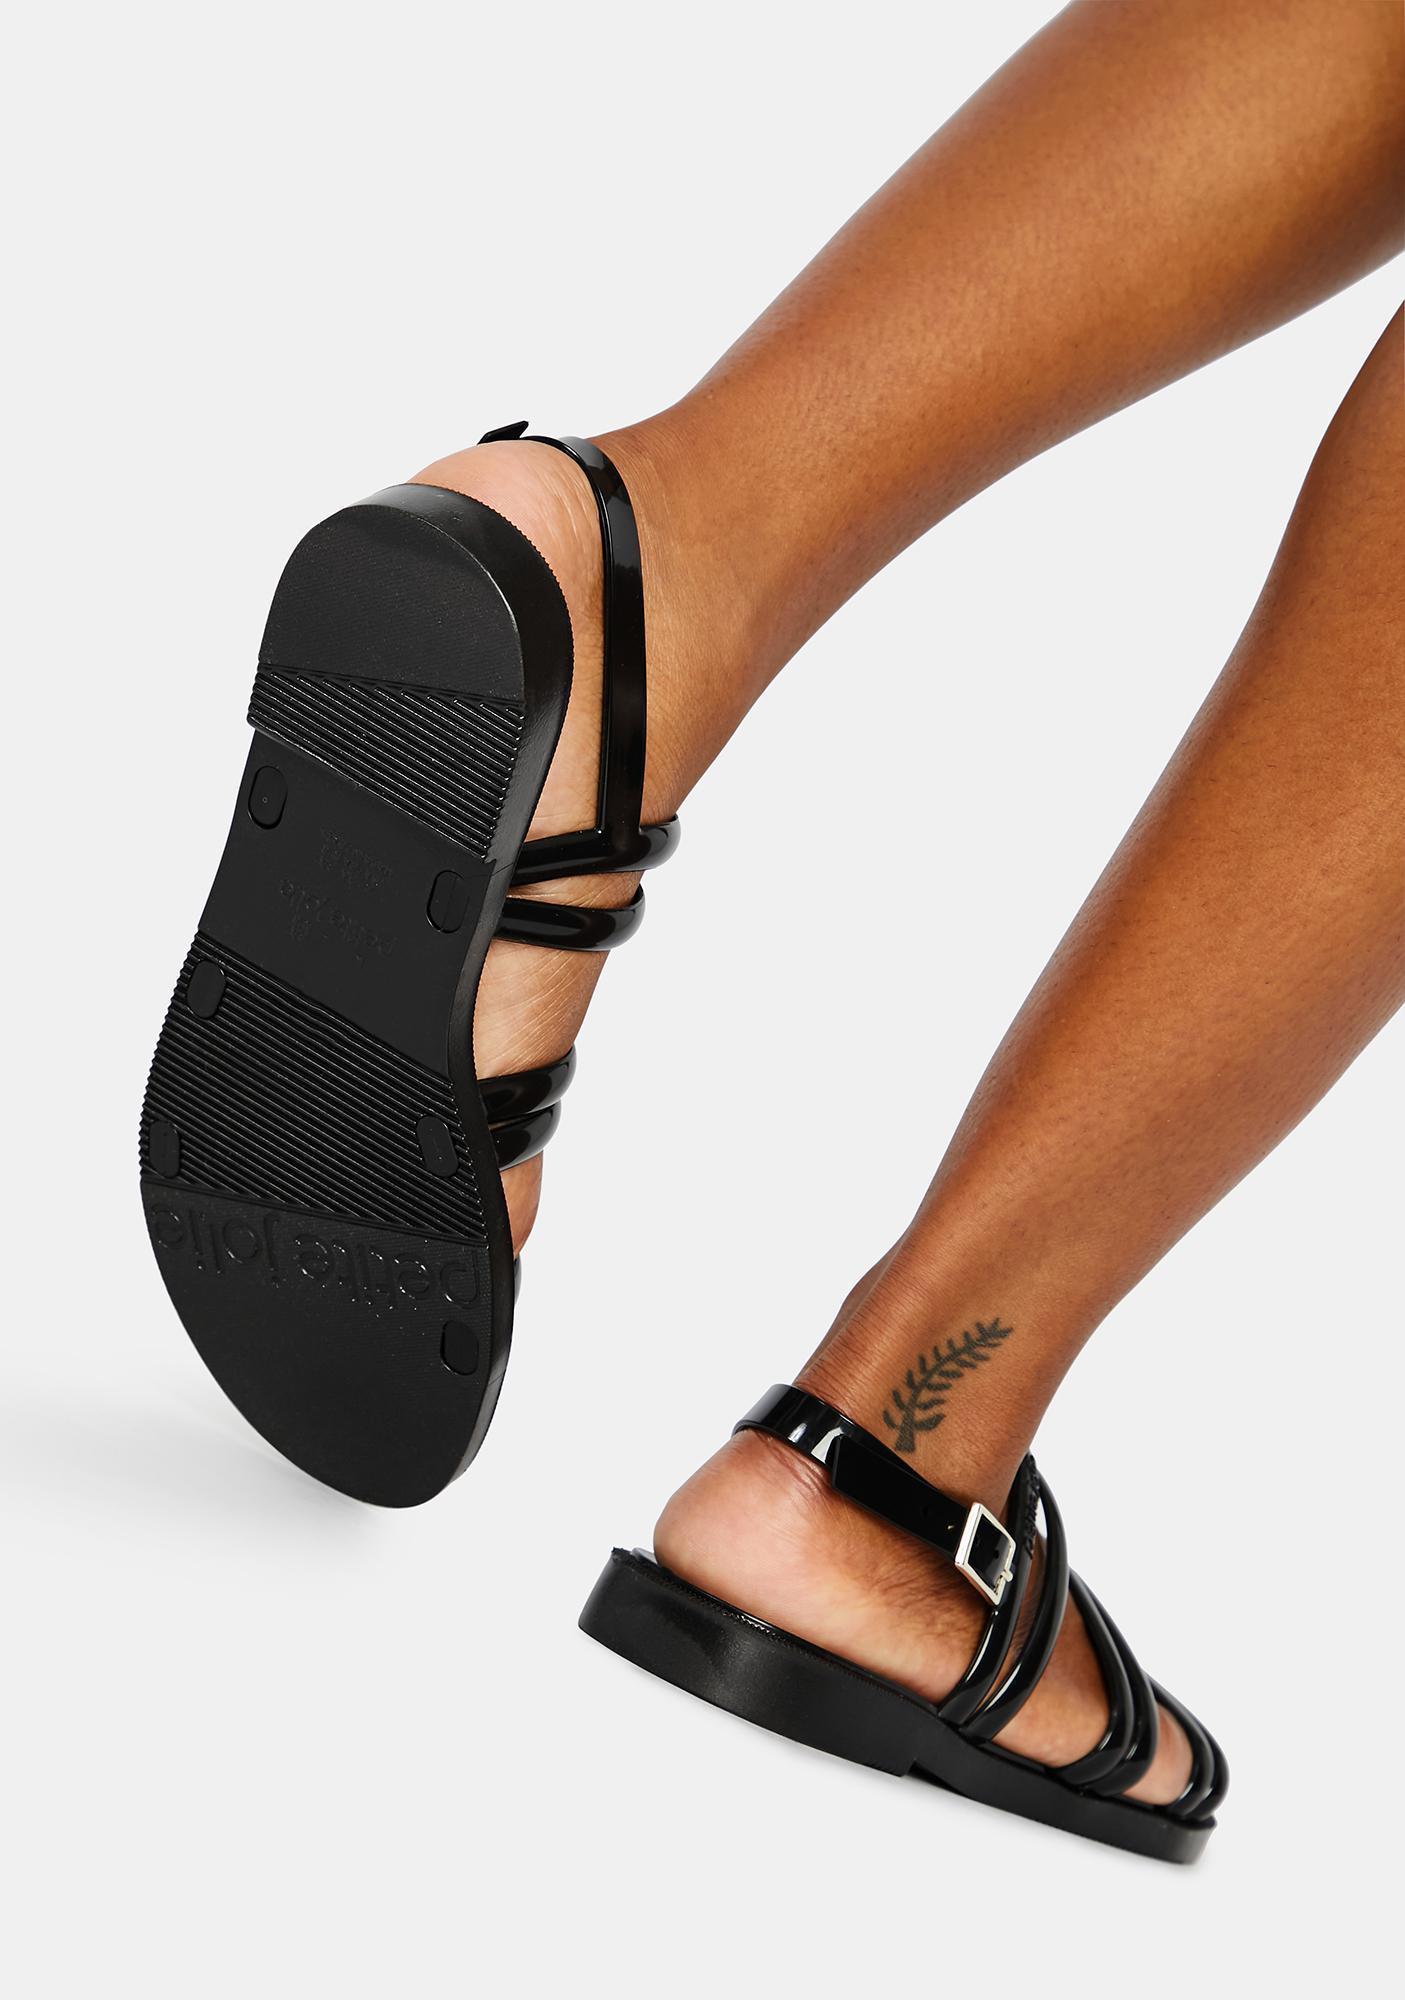 Petite Jolie Black Rio Jelly Sandals